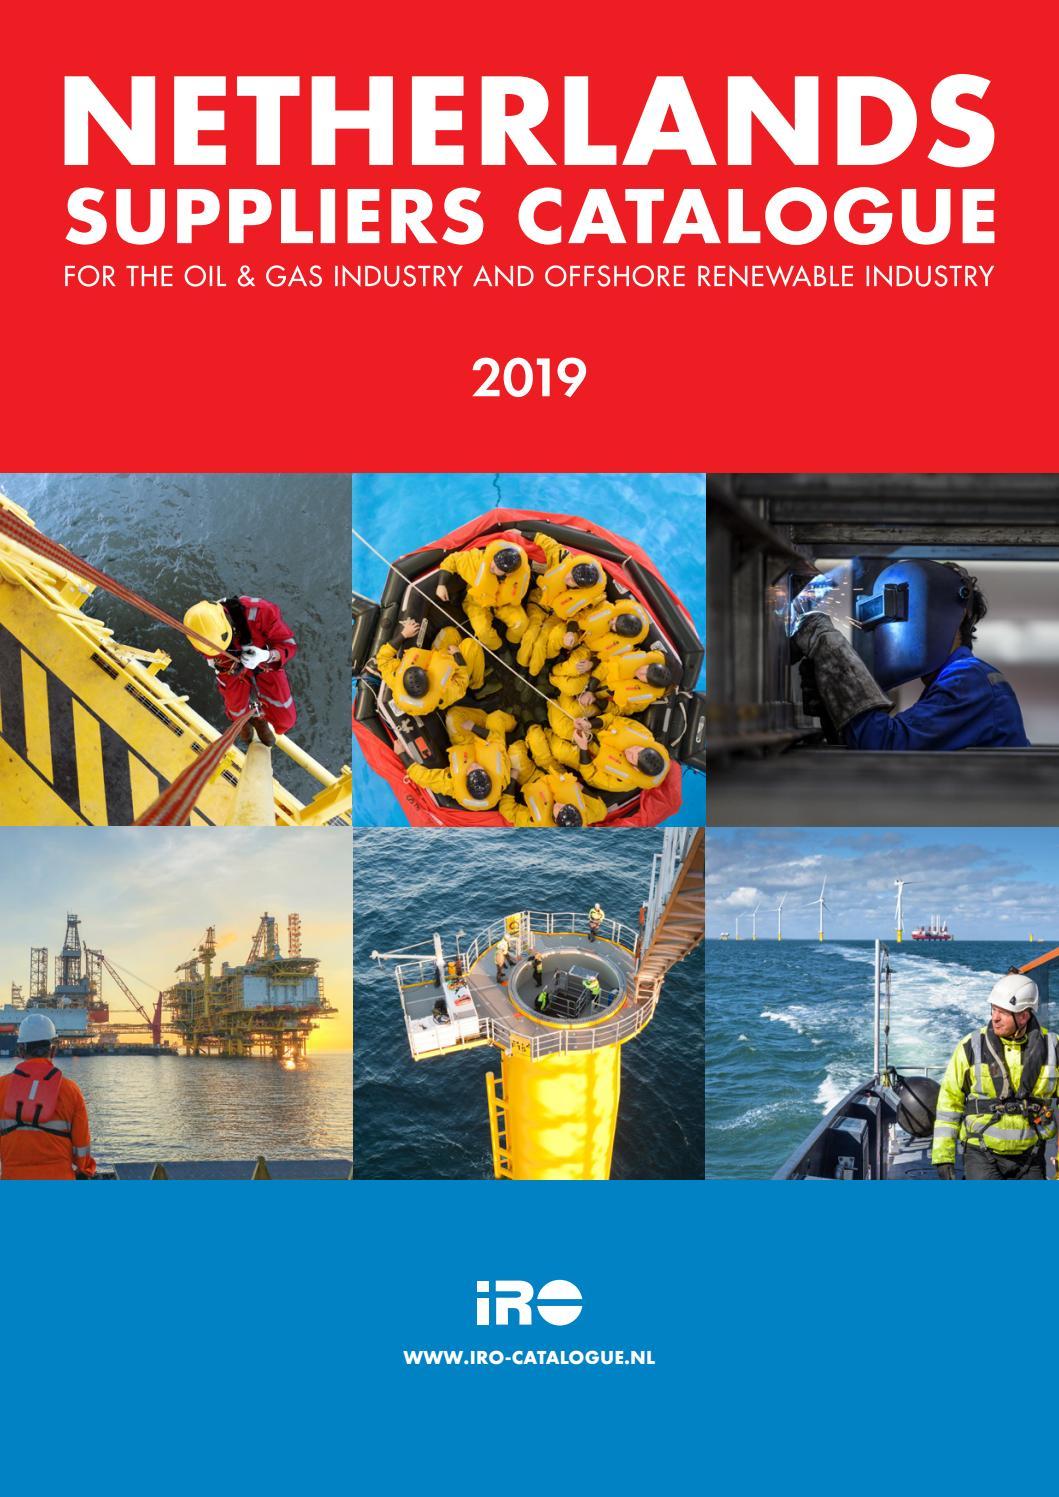 Iro Netherlands Suppliers Catalogue 2019 By Pedemex Bv Issuu